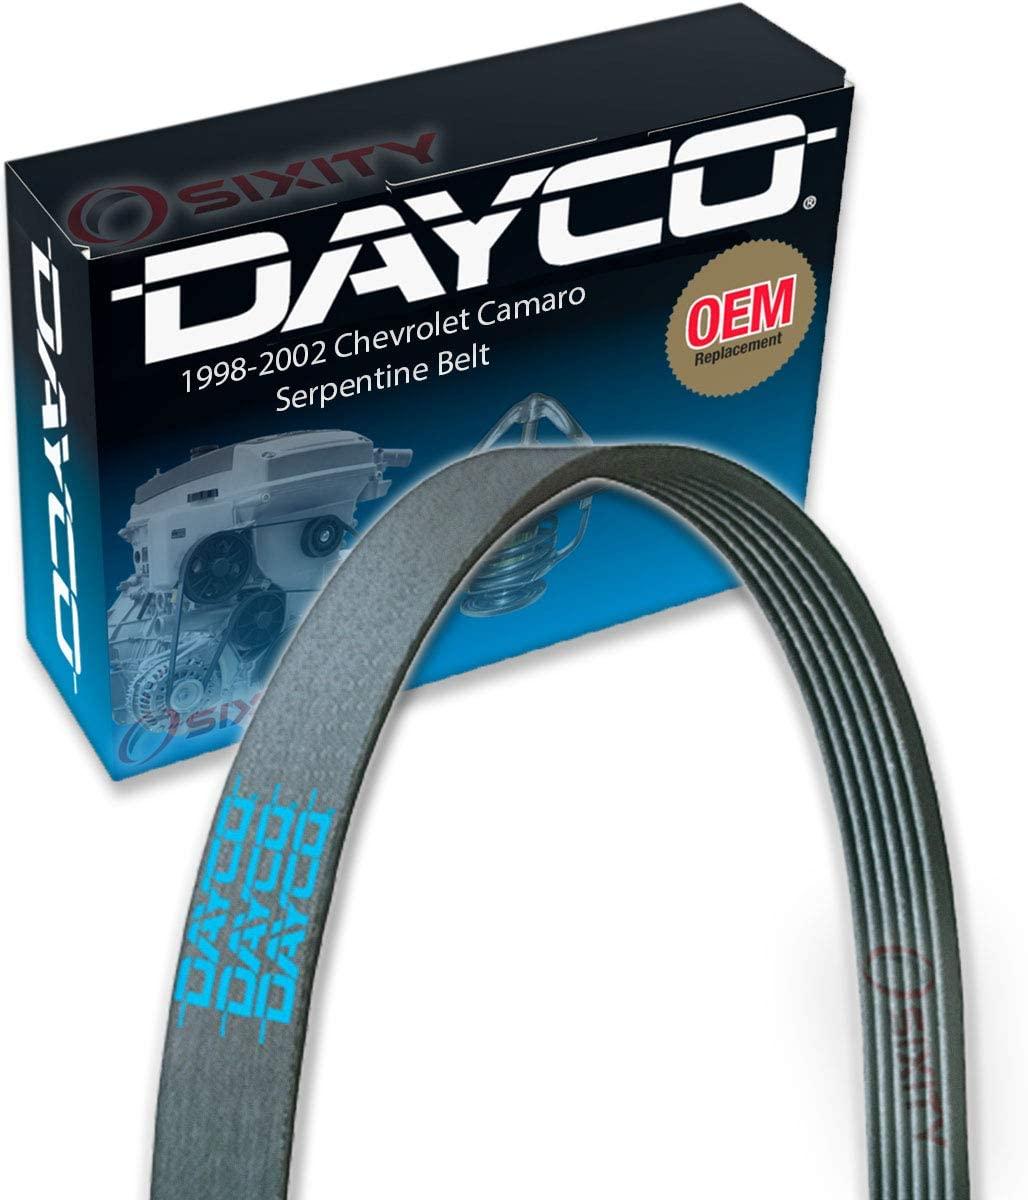 Dayco Serpentine Belt for 1998-2002 Chevrolet Camaro 5.7L V8 - V Belt Ribbed Accessory Drive